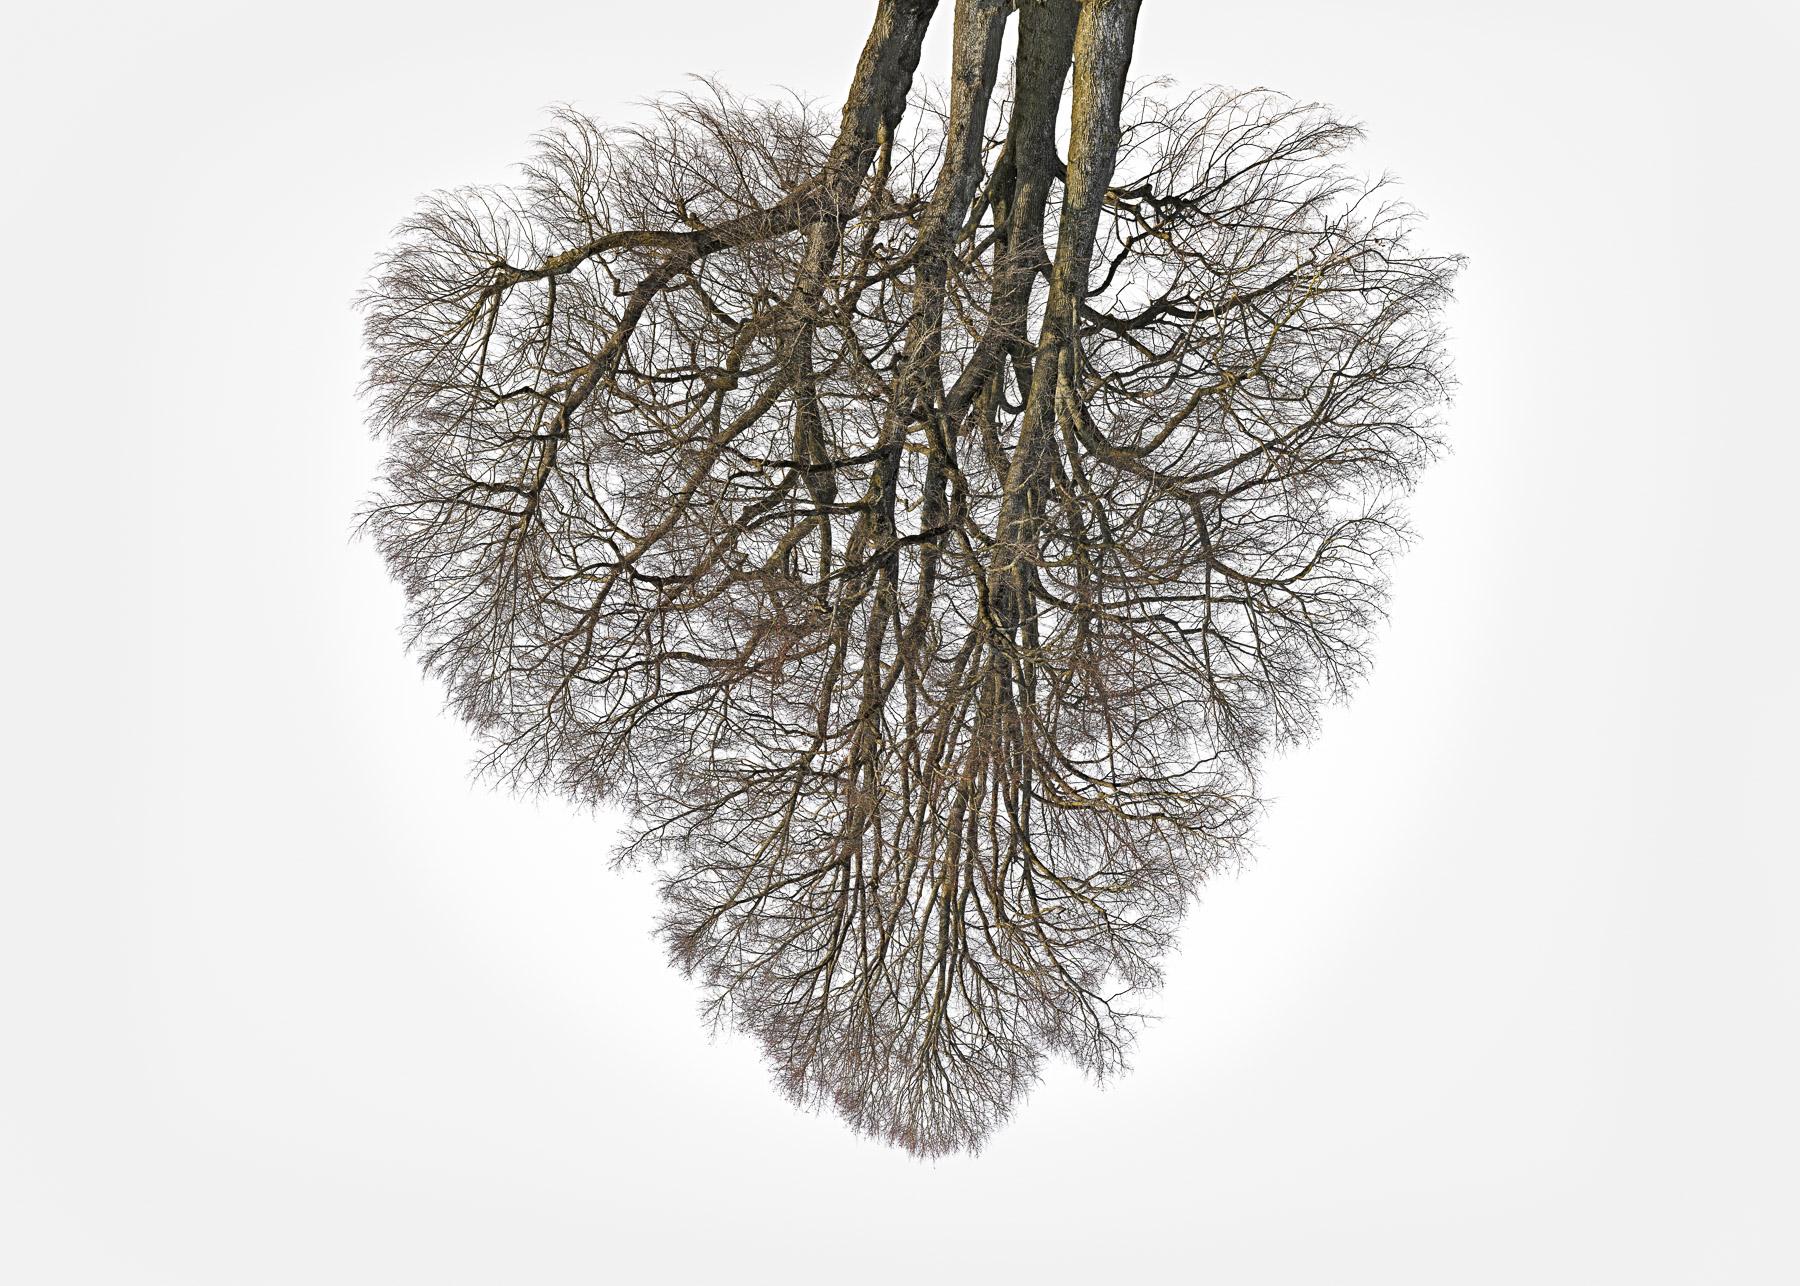 Christoph_Franke_Tree-Crowns_TC-23_02.jpg